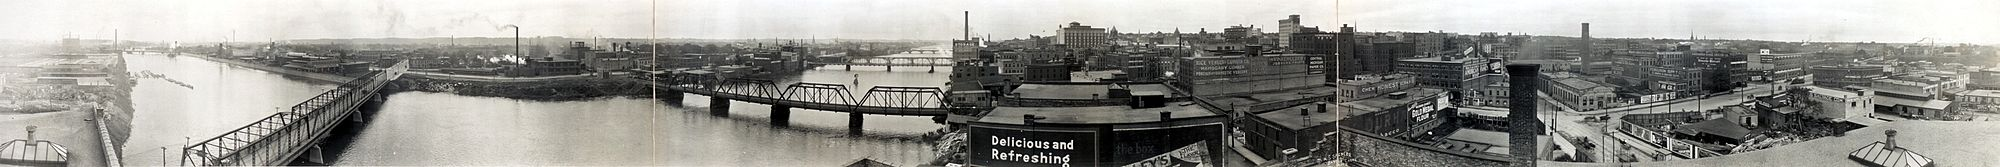 1915 panorama